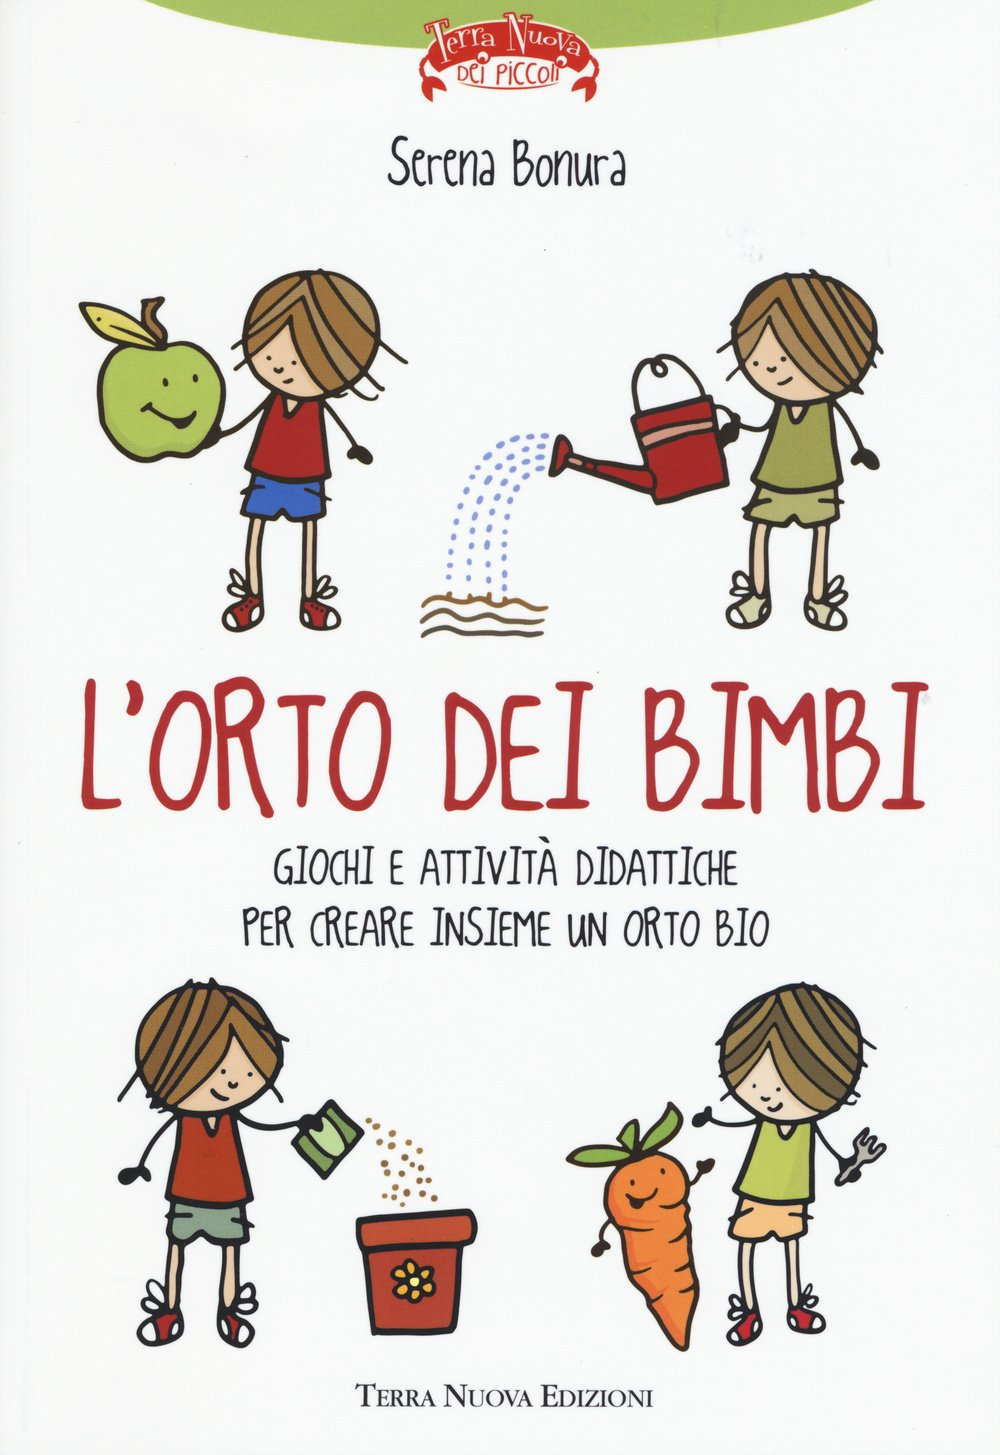 Lorto Dei Bimbi Amazonit Serena Bonura Libri